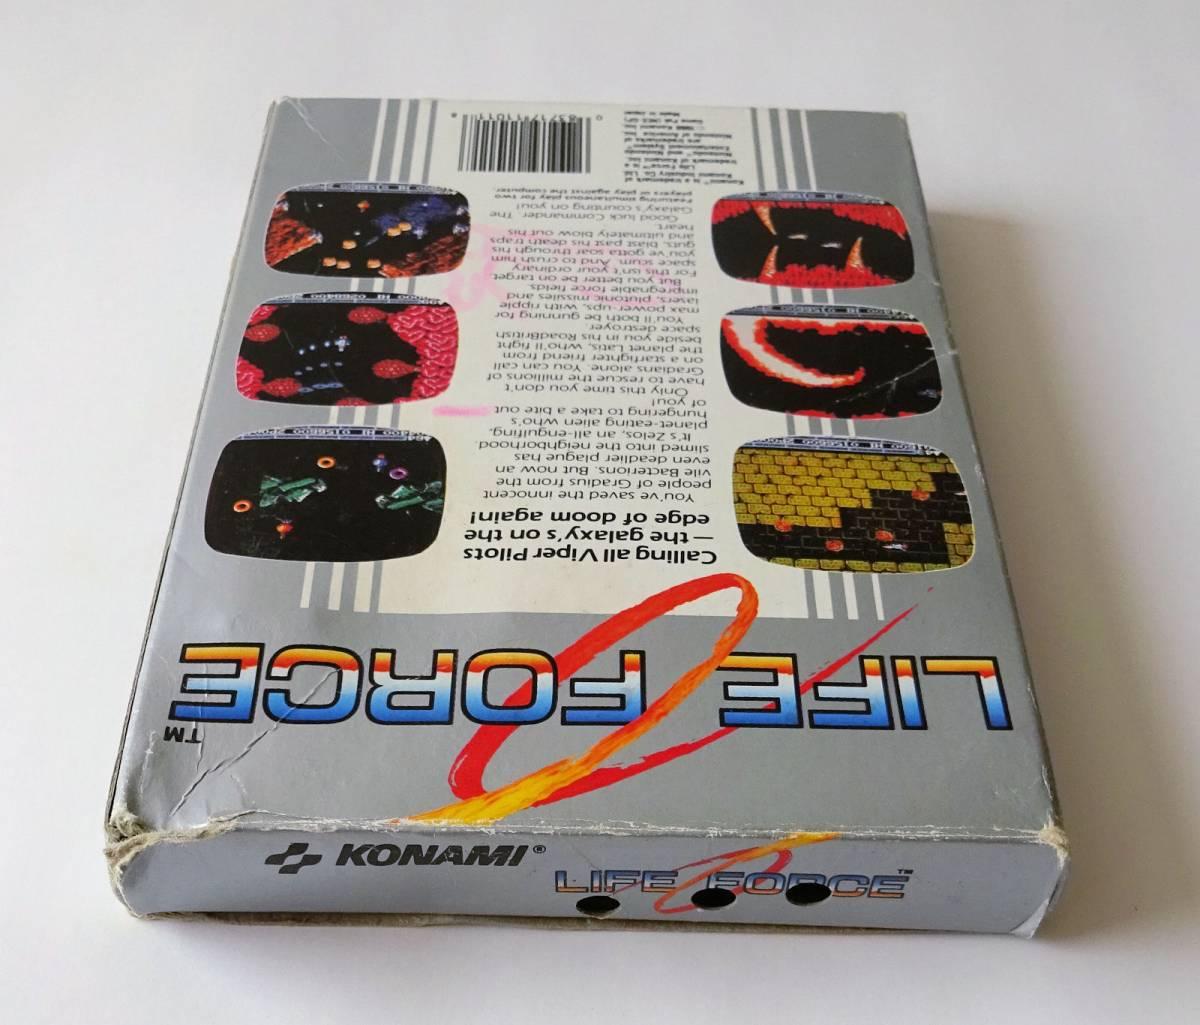 NES ★ 沙羅曼蛇 LIFE FORCE (Konami) ★ 海外版 FC 用ソフト_画像2